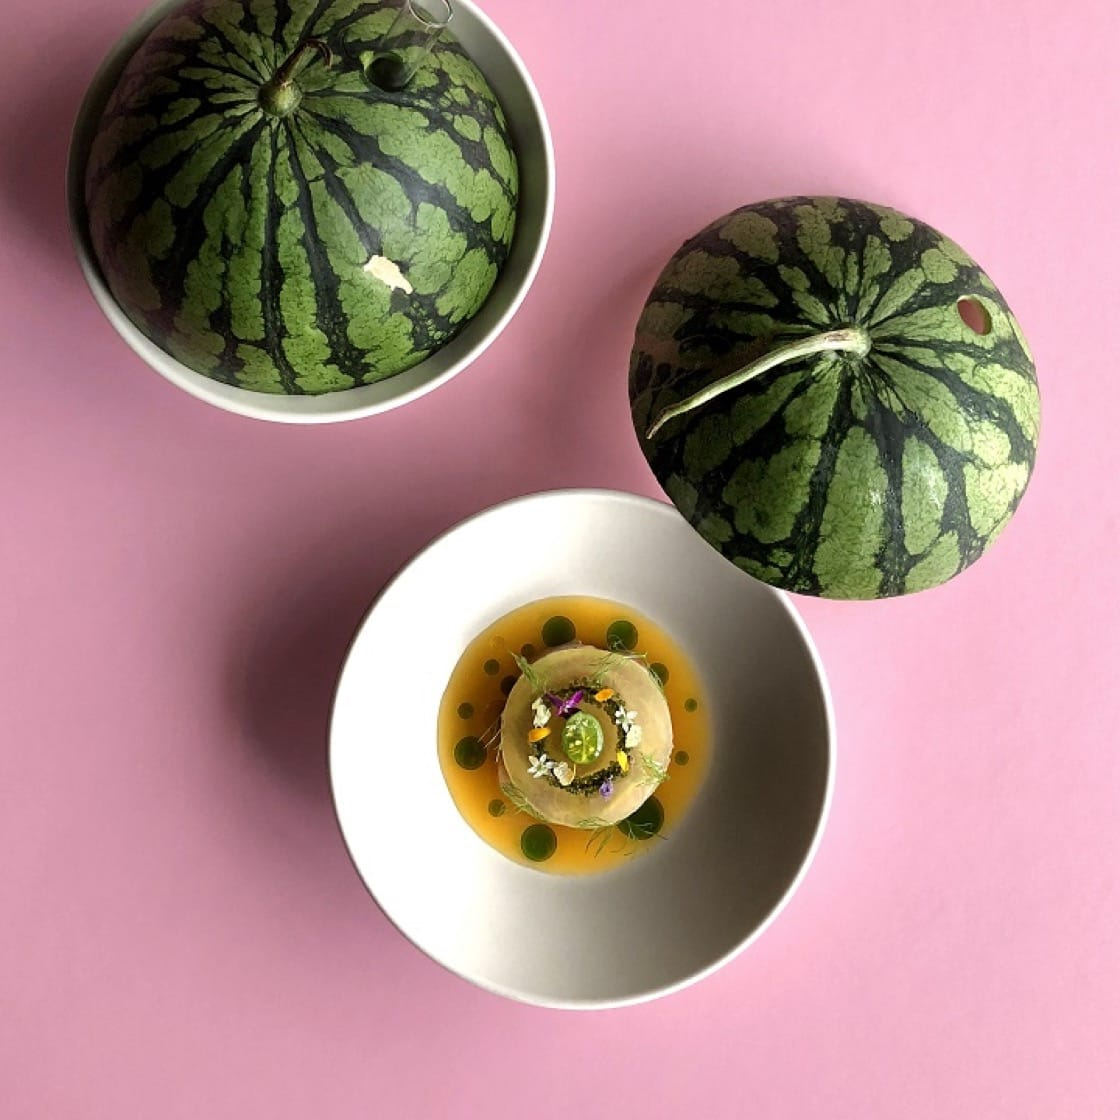 RAW夏季菜單之小玉西瓜/澎湖紅甘/紅心芭樂,Ben Branson搭配的是一款清新的「Smoked Watermelon Shrub」。